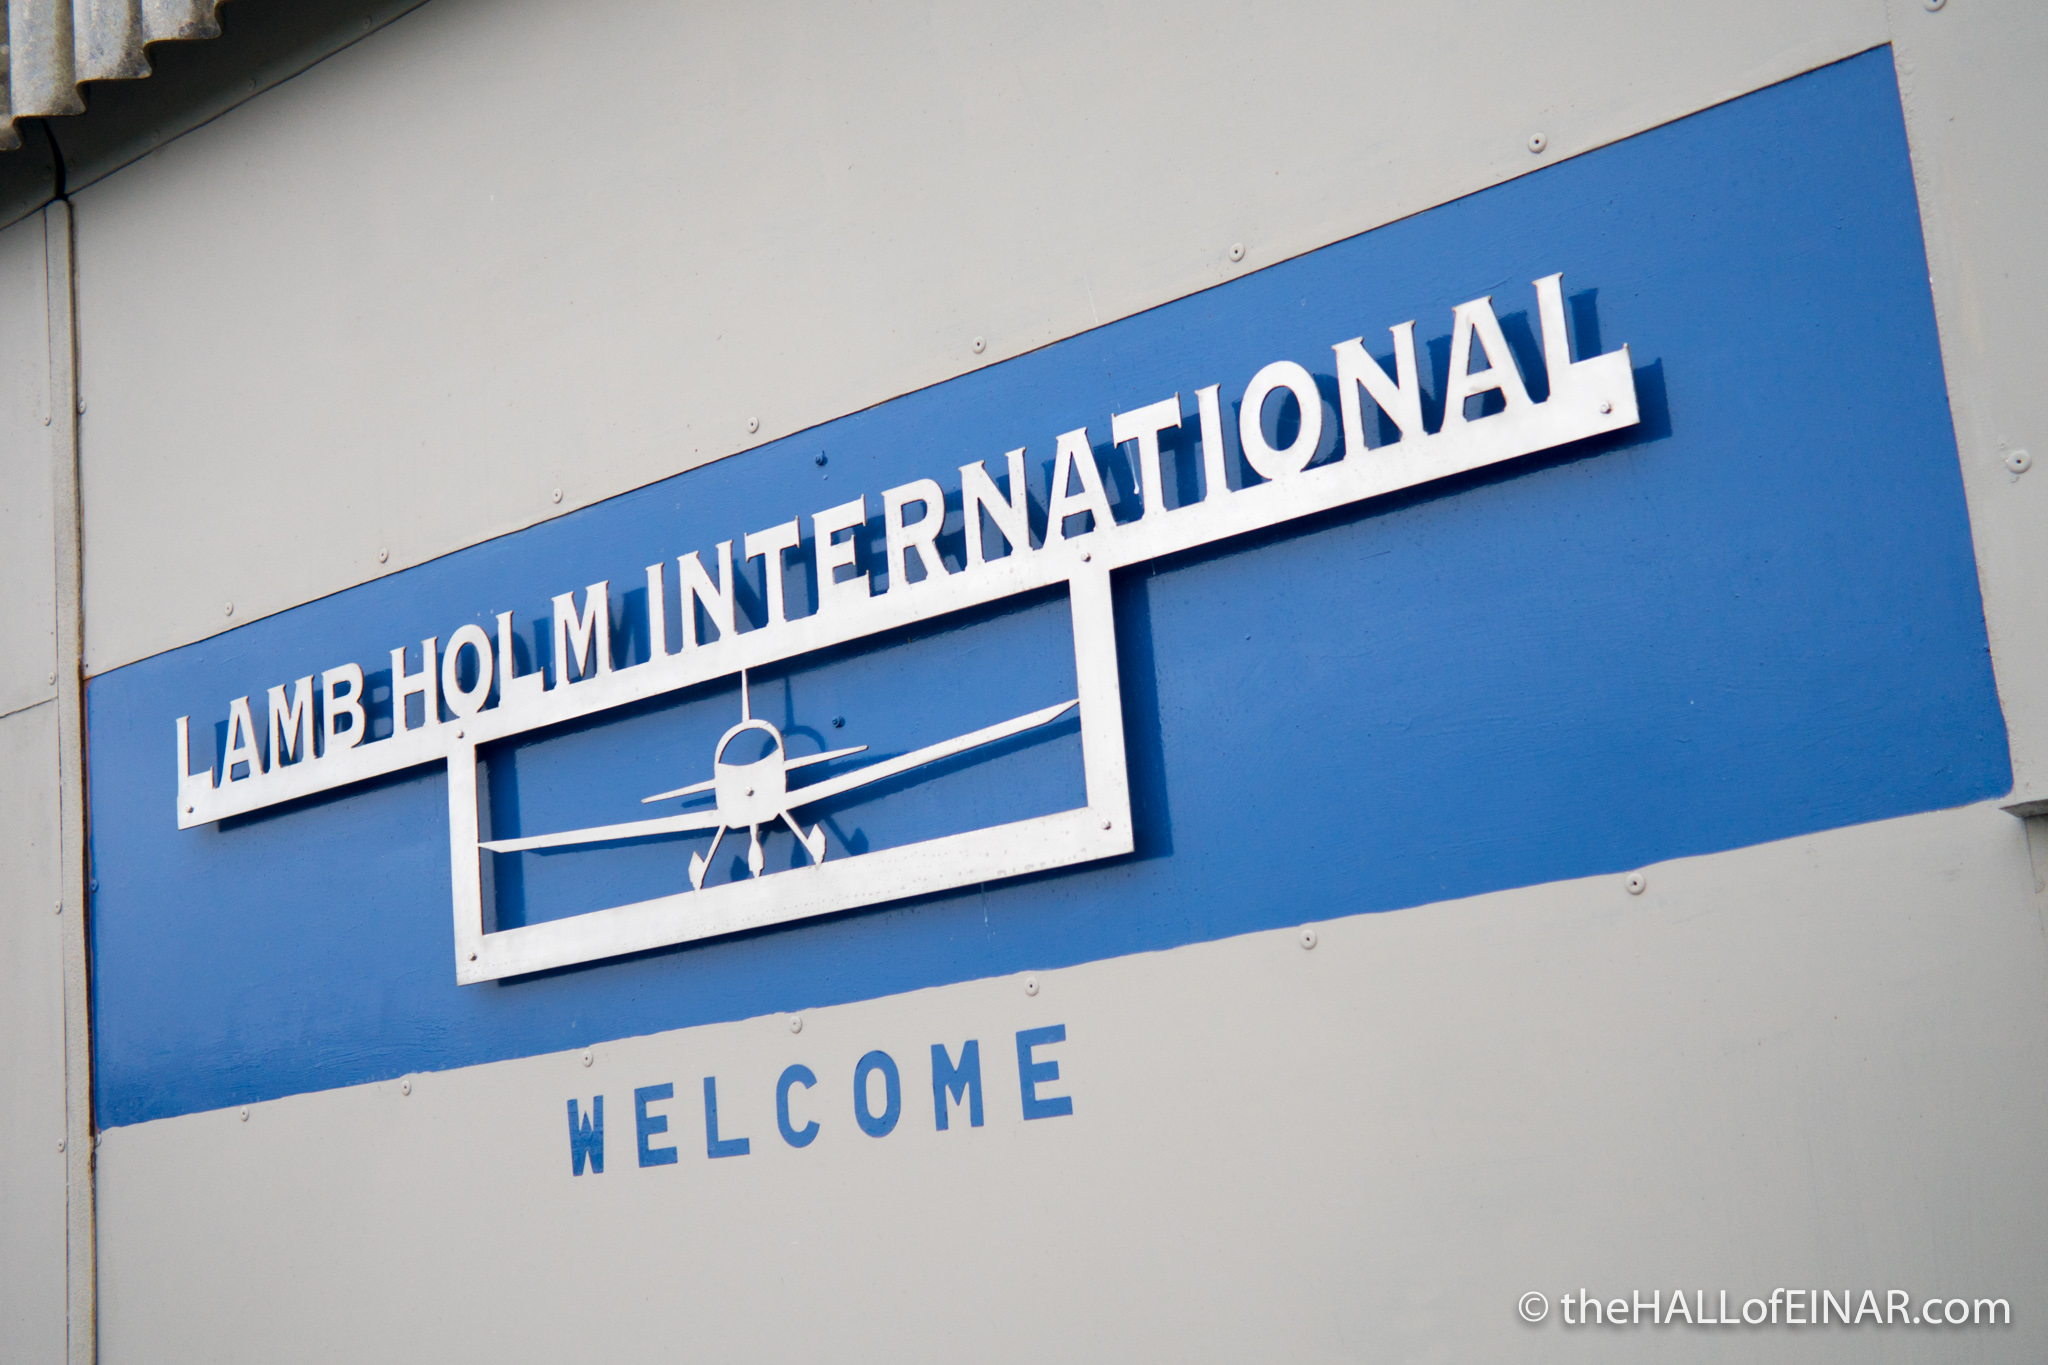 Lamb Holm International Airport